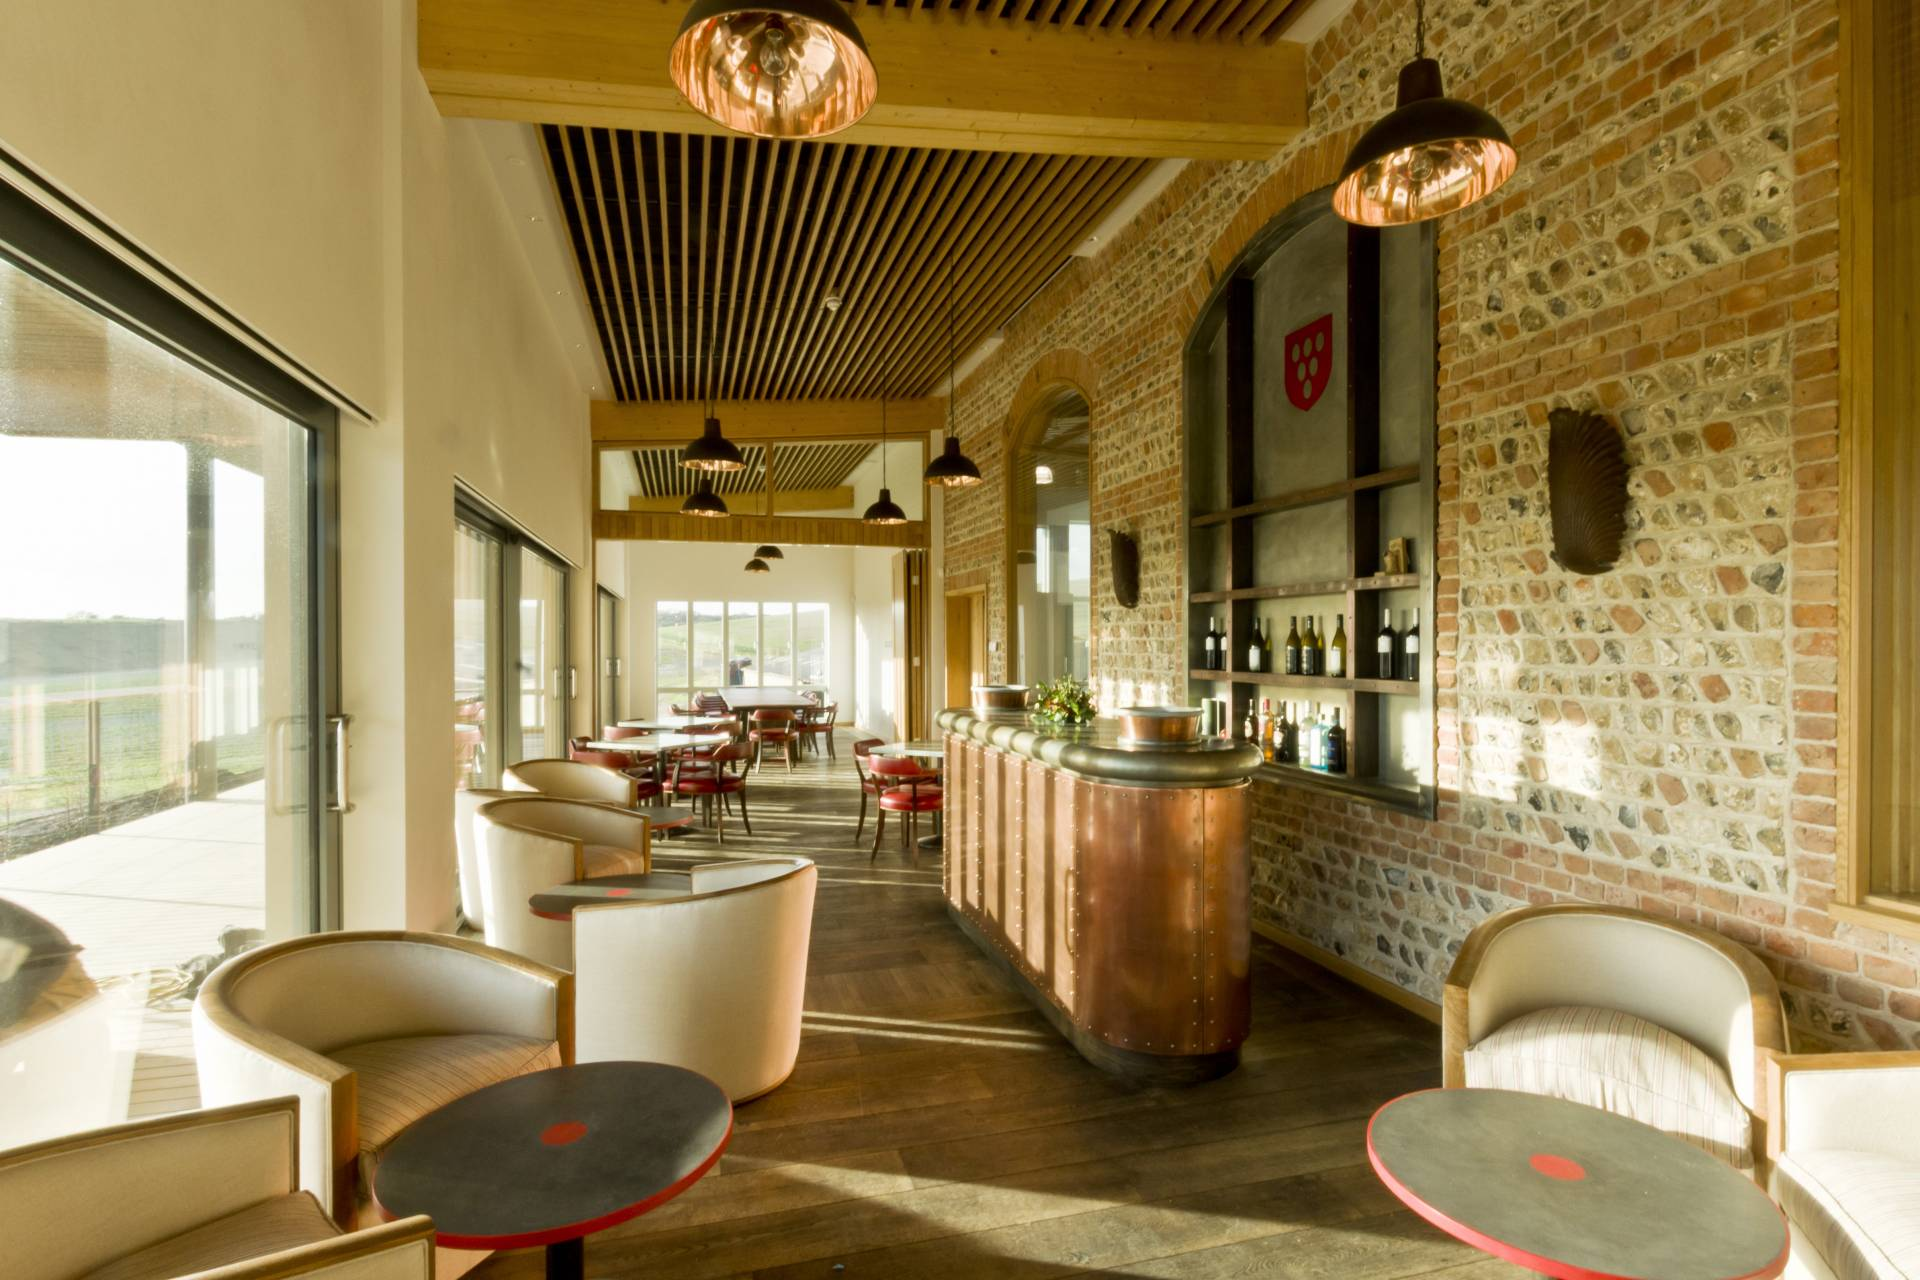 Rathfinny Winery bar and restaurant